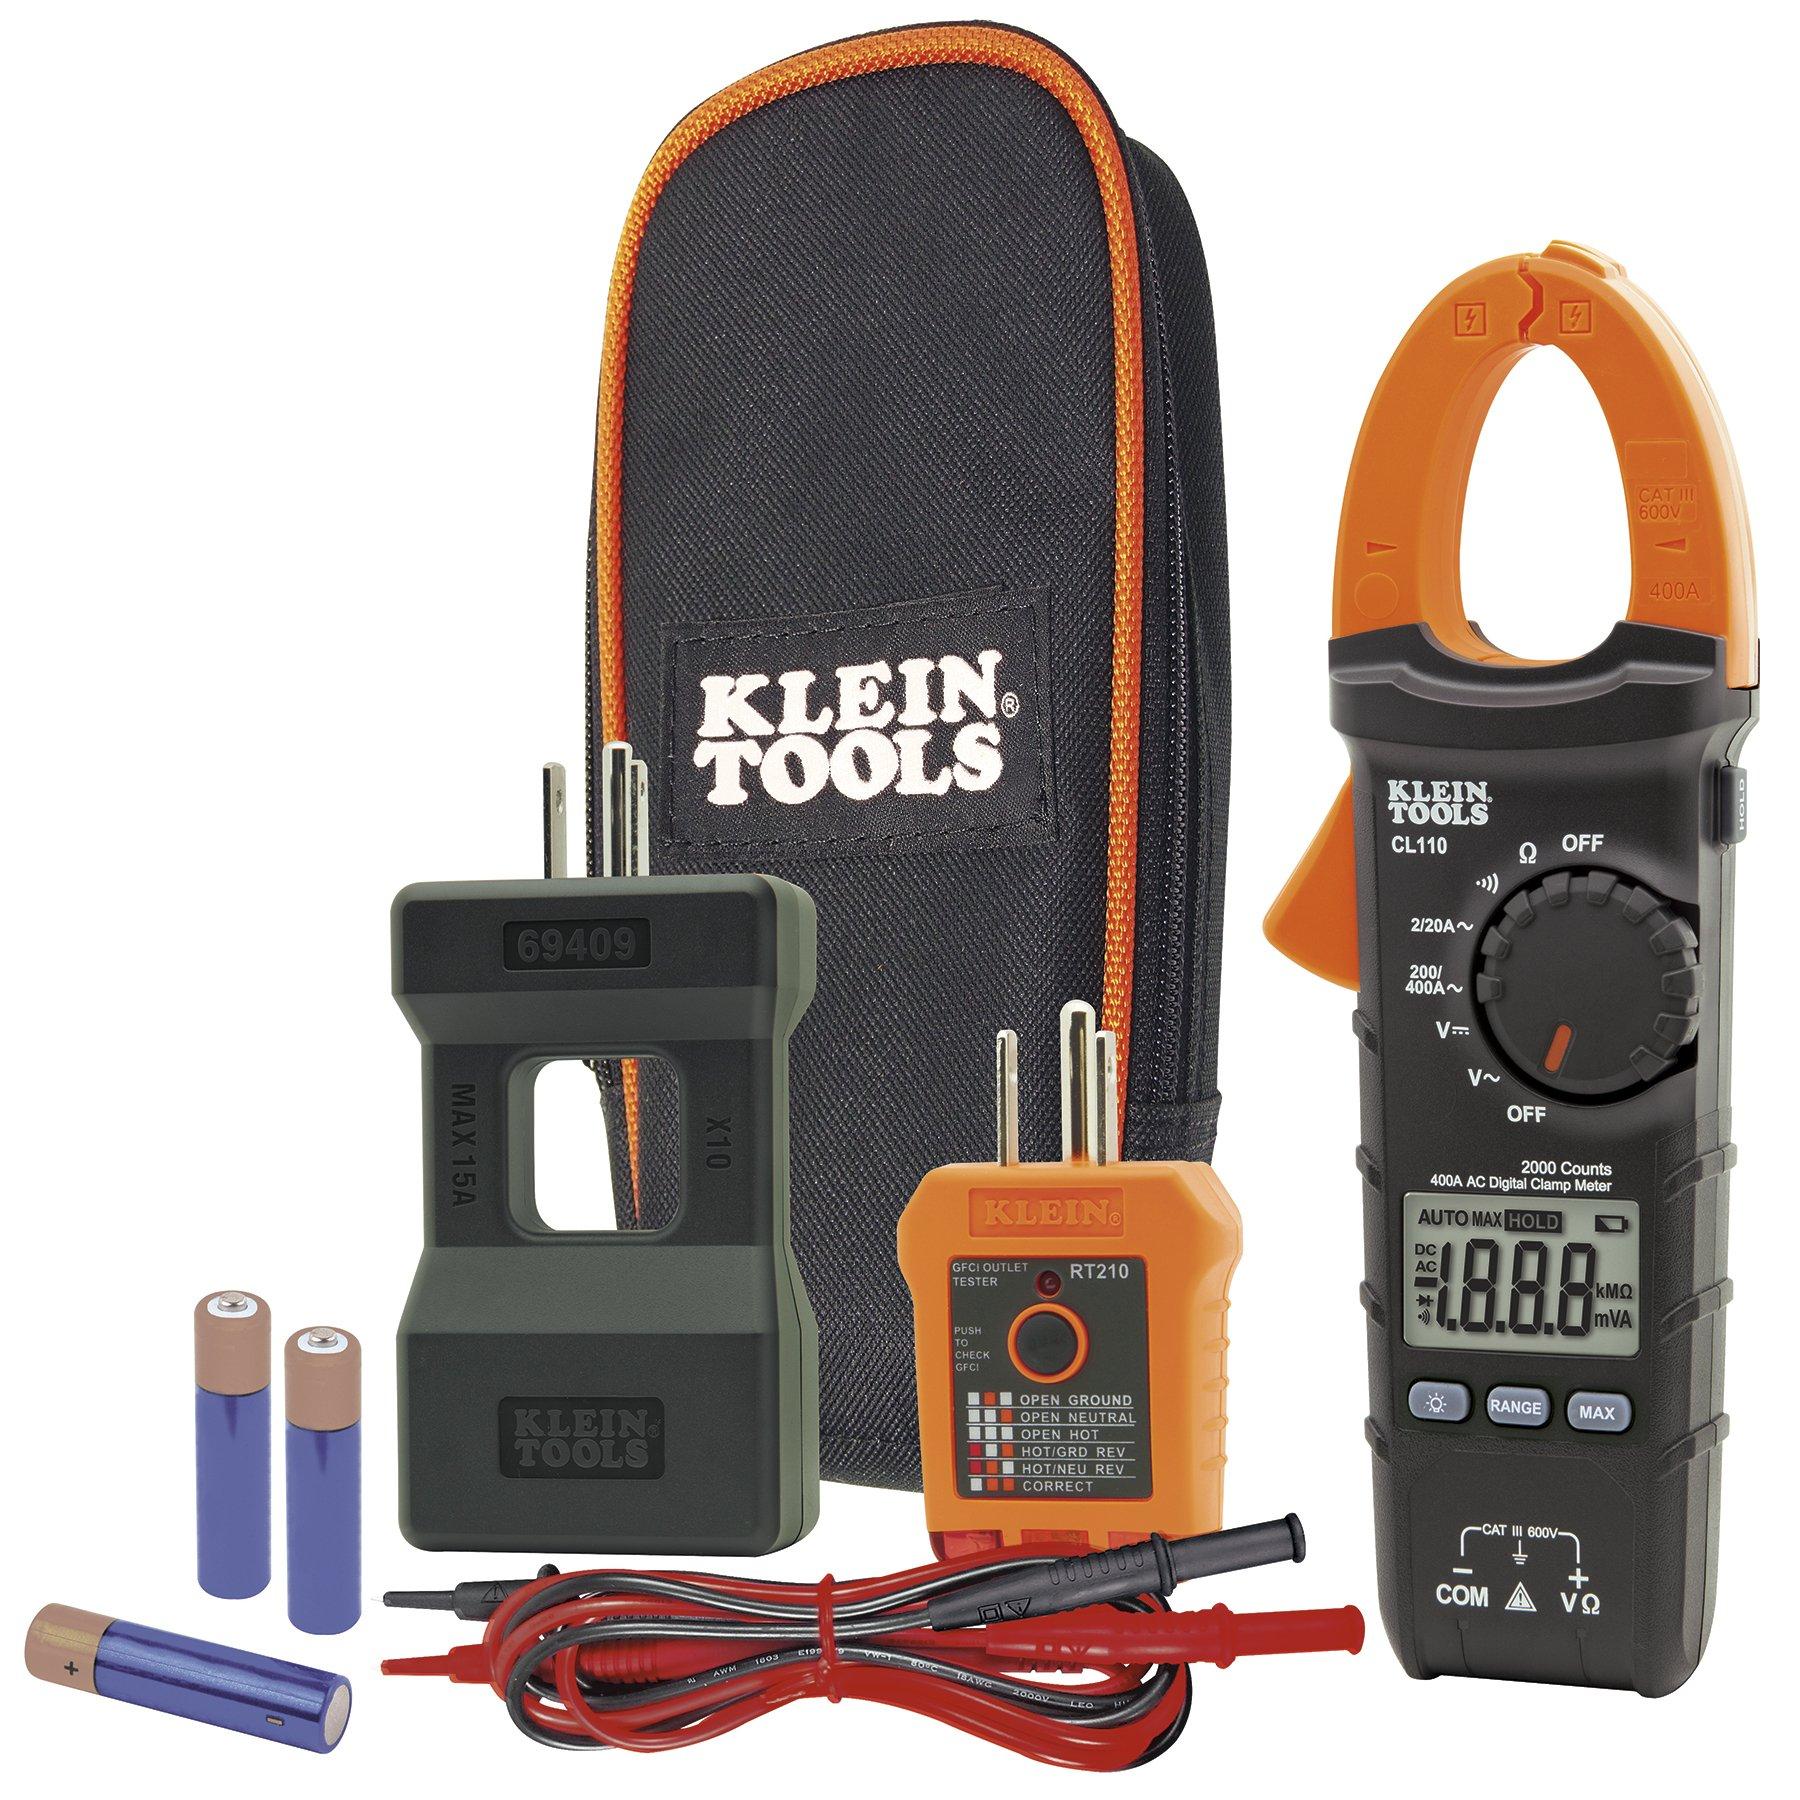 Klein Tools CL110 Clamp Meter